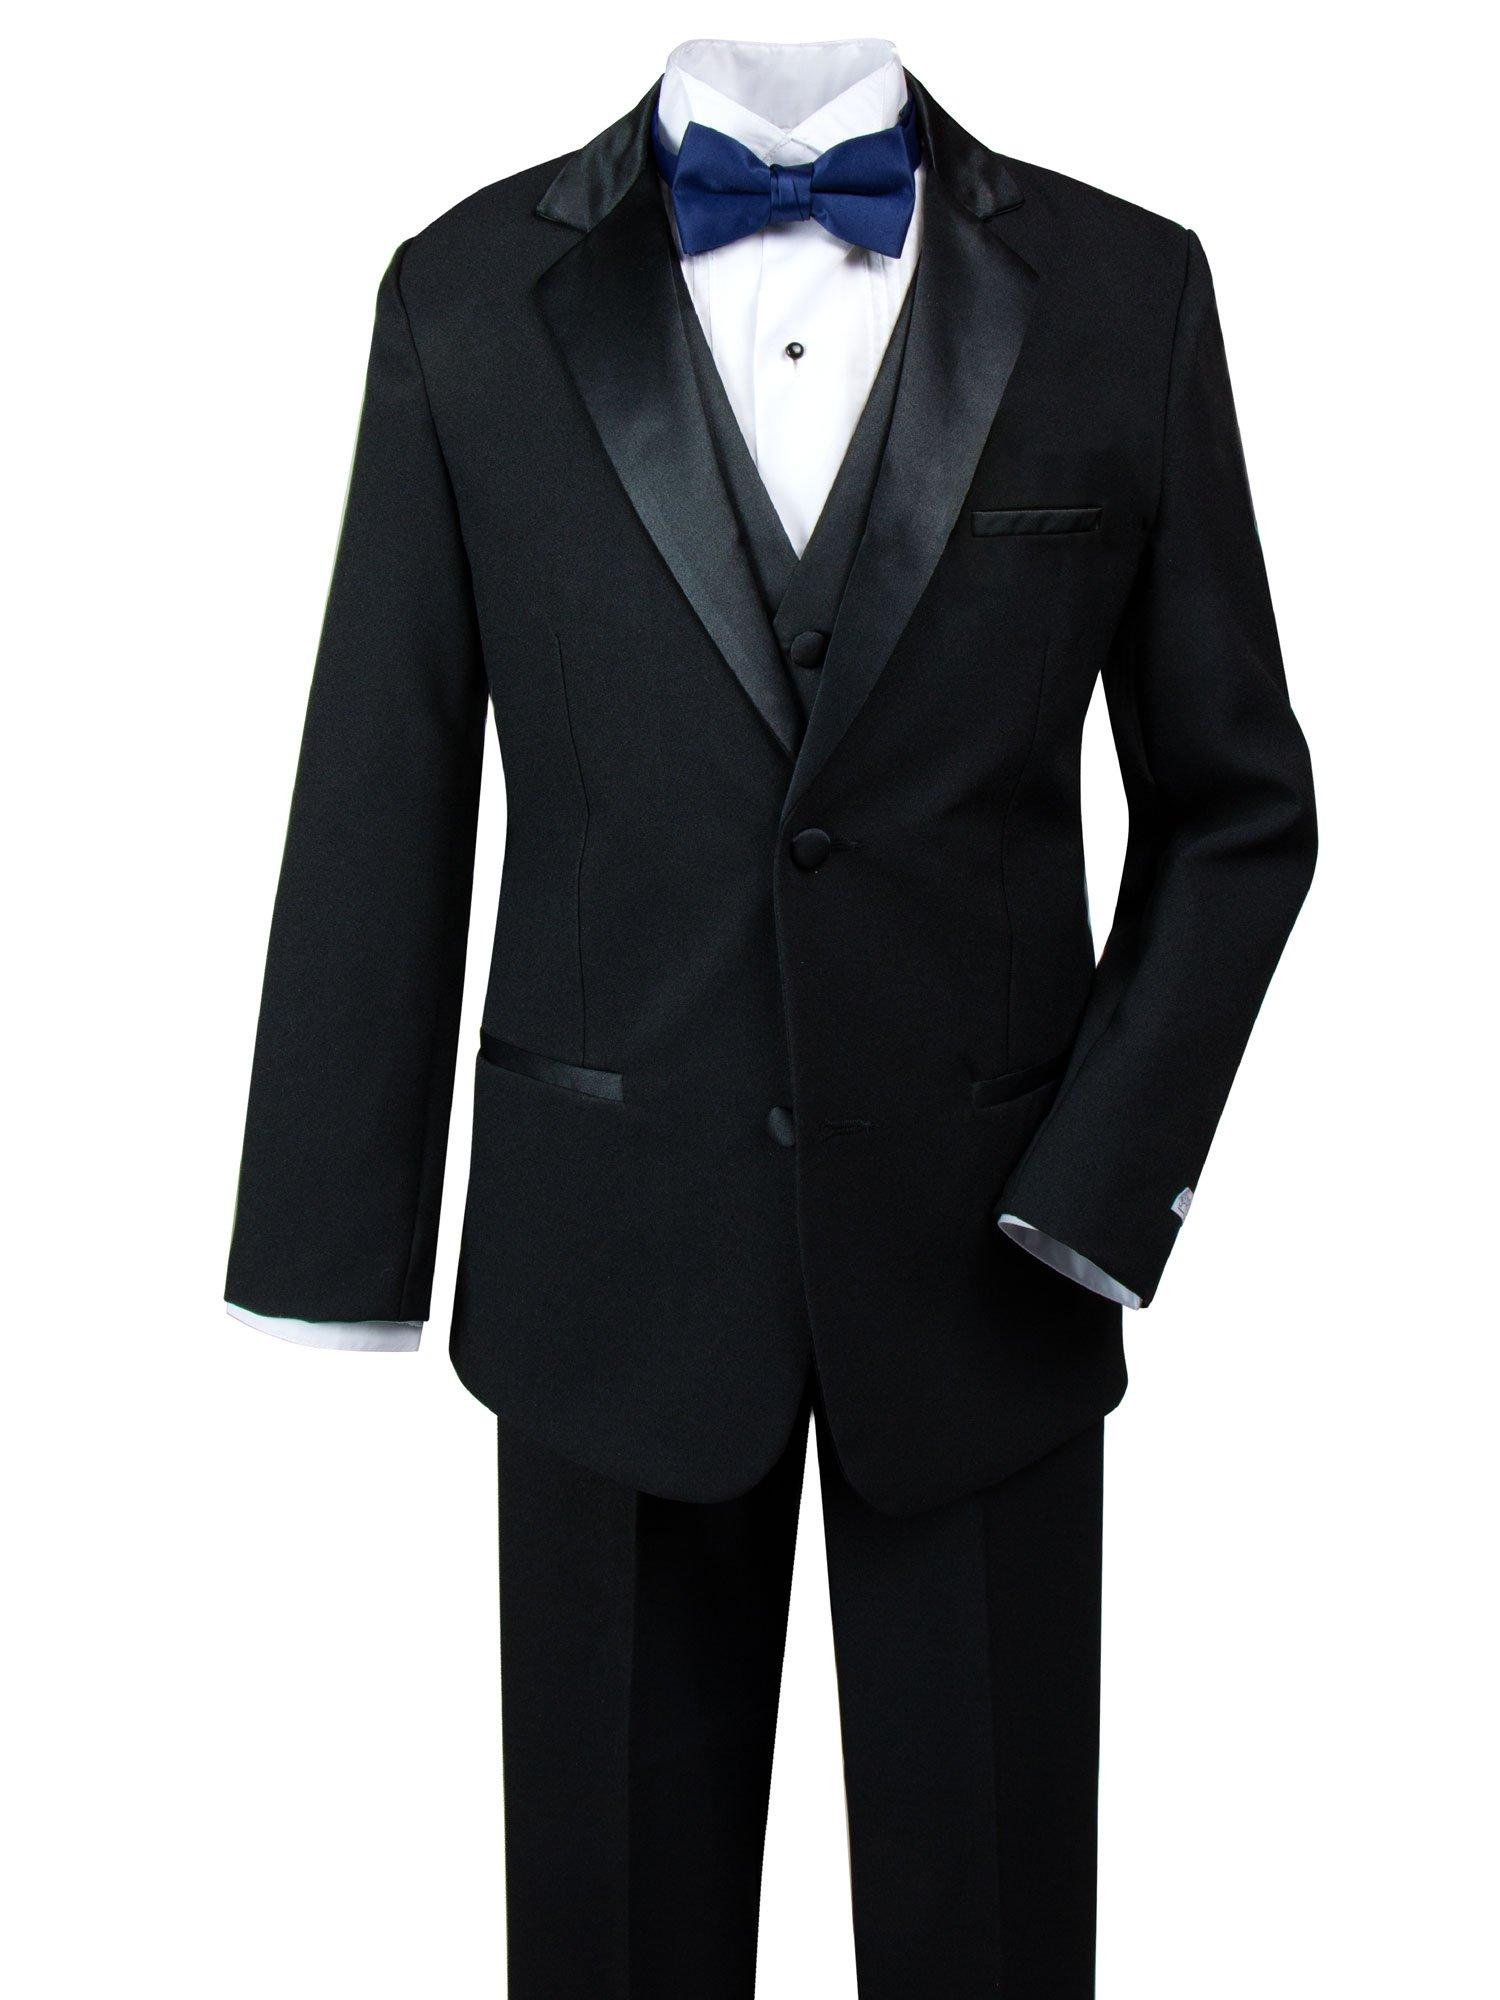 Spring Notion Big Boys' Modern Fit Tuxedo Set, No Tail 12 Black-Navy